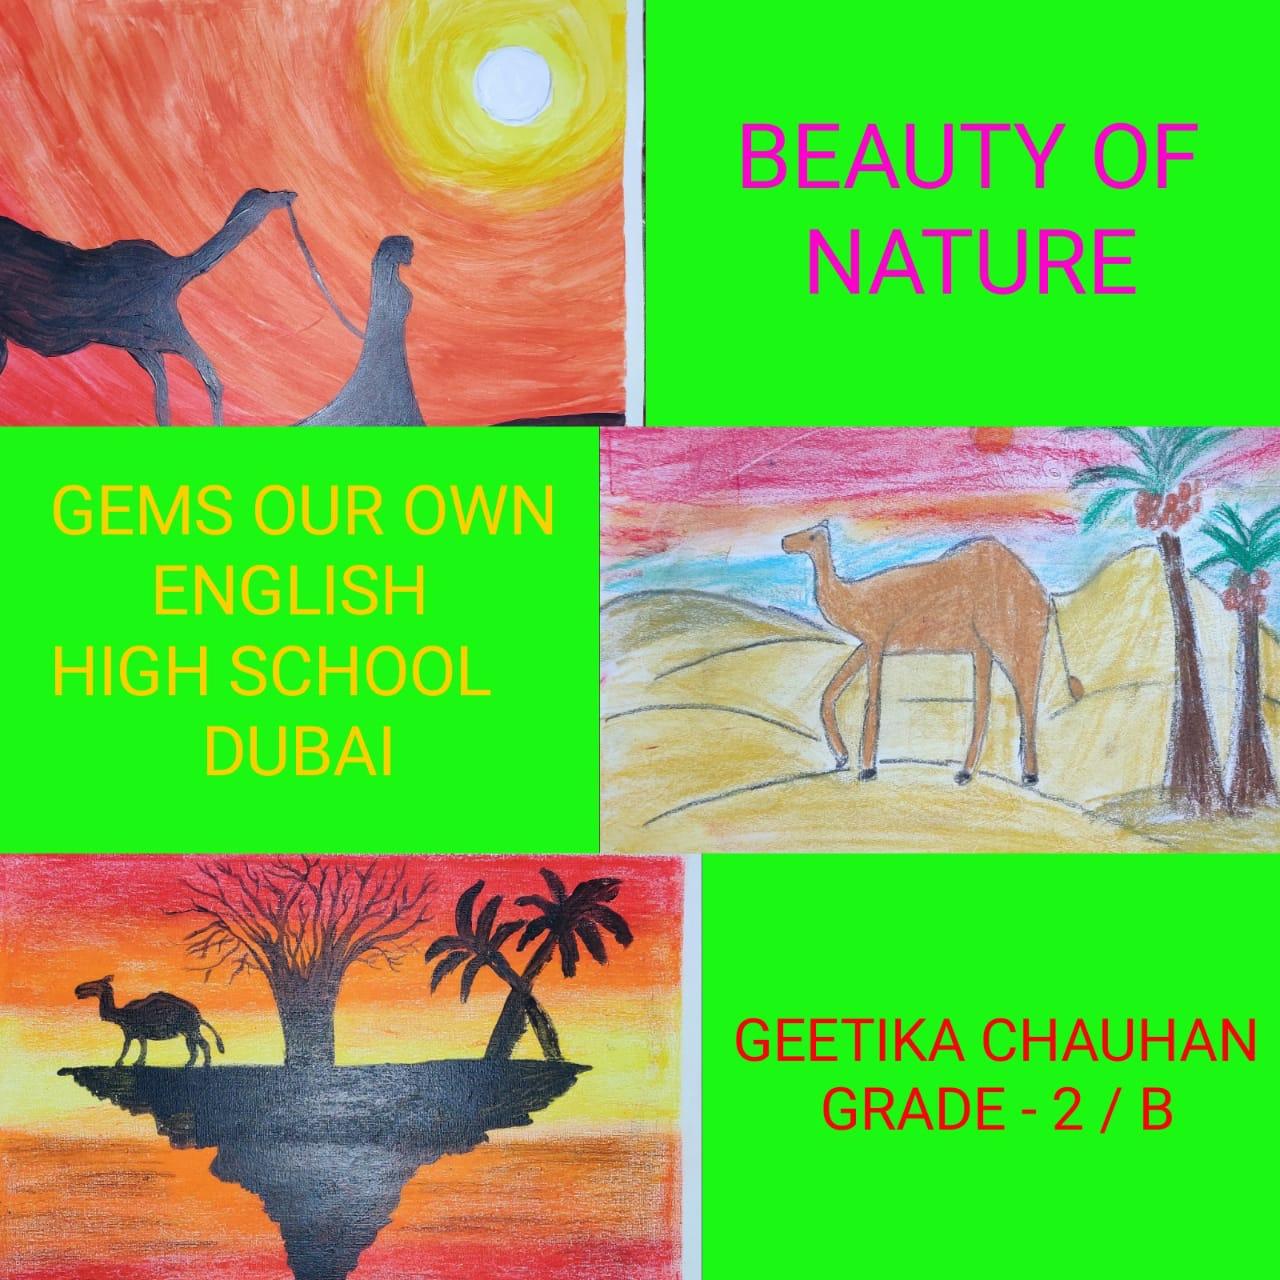 Favorite Places in UAE by Geetika Singh Chauhan